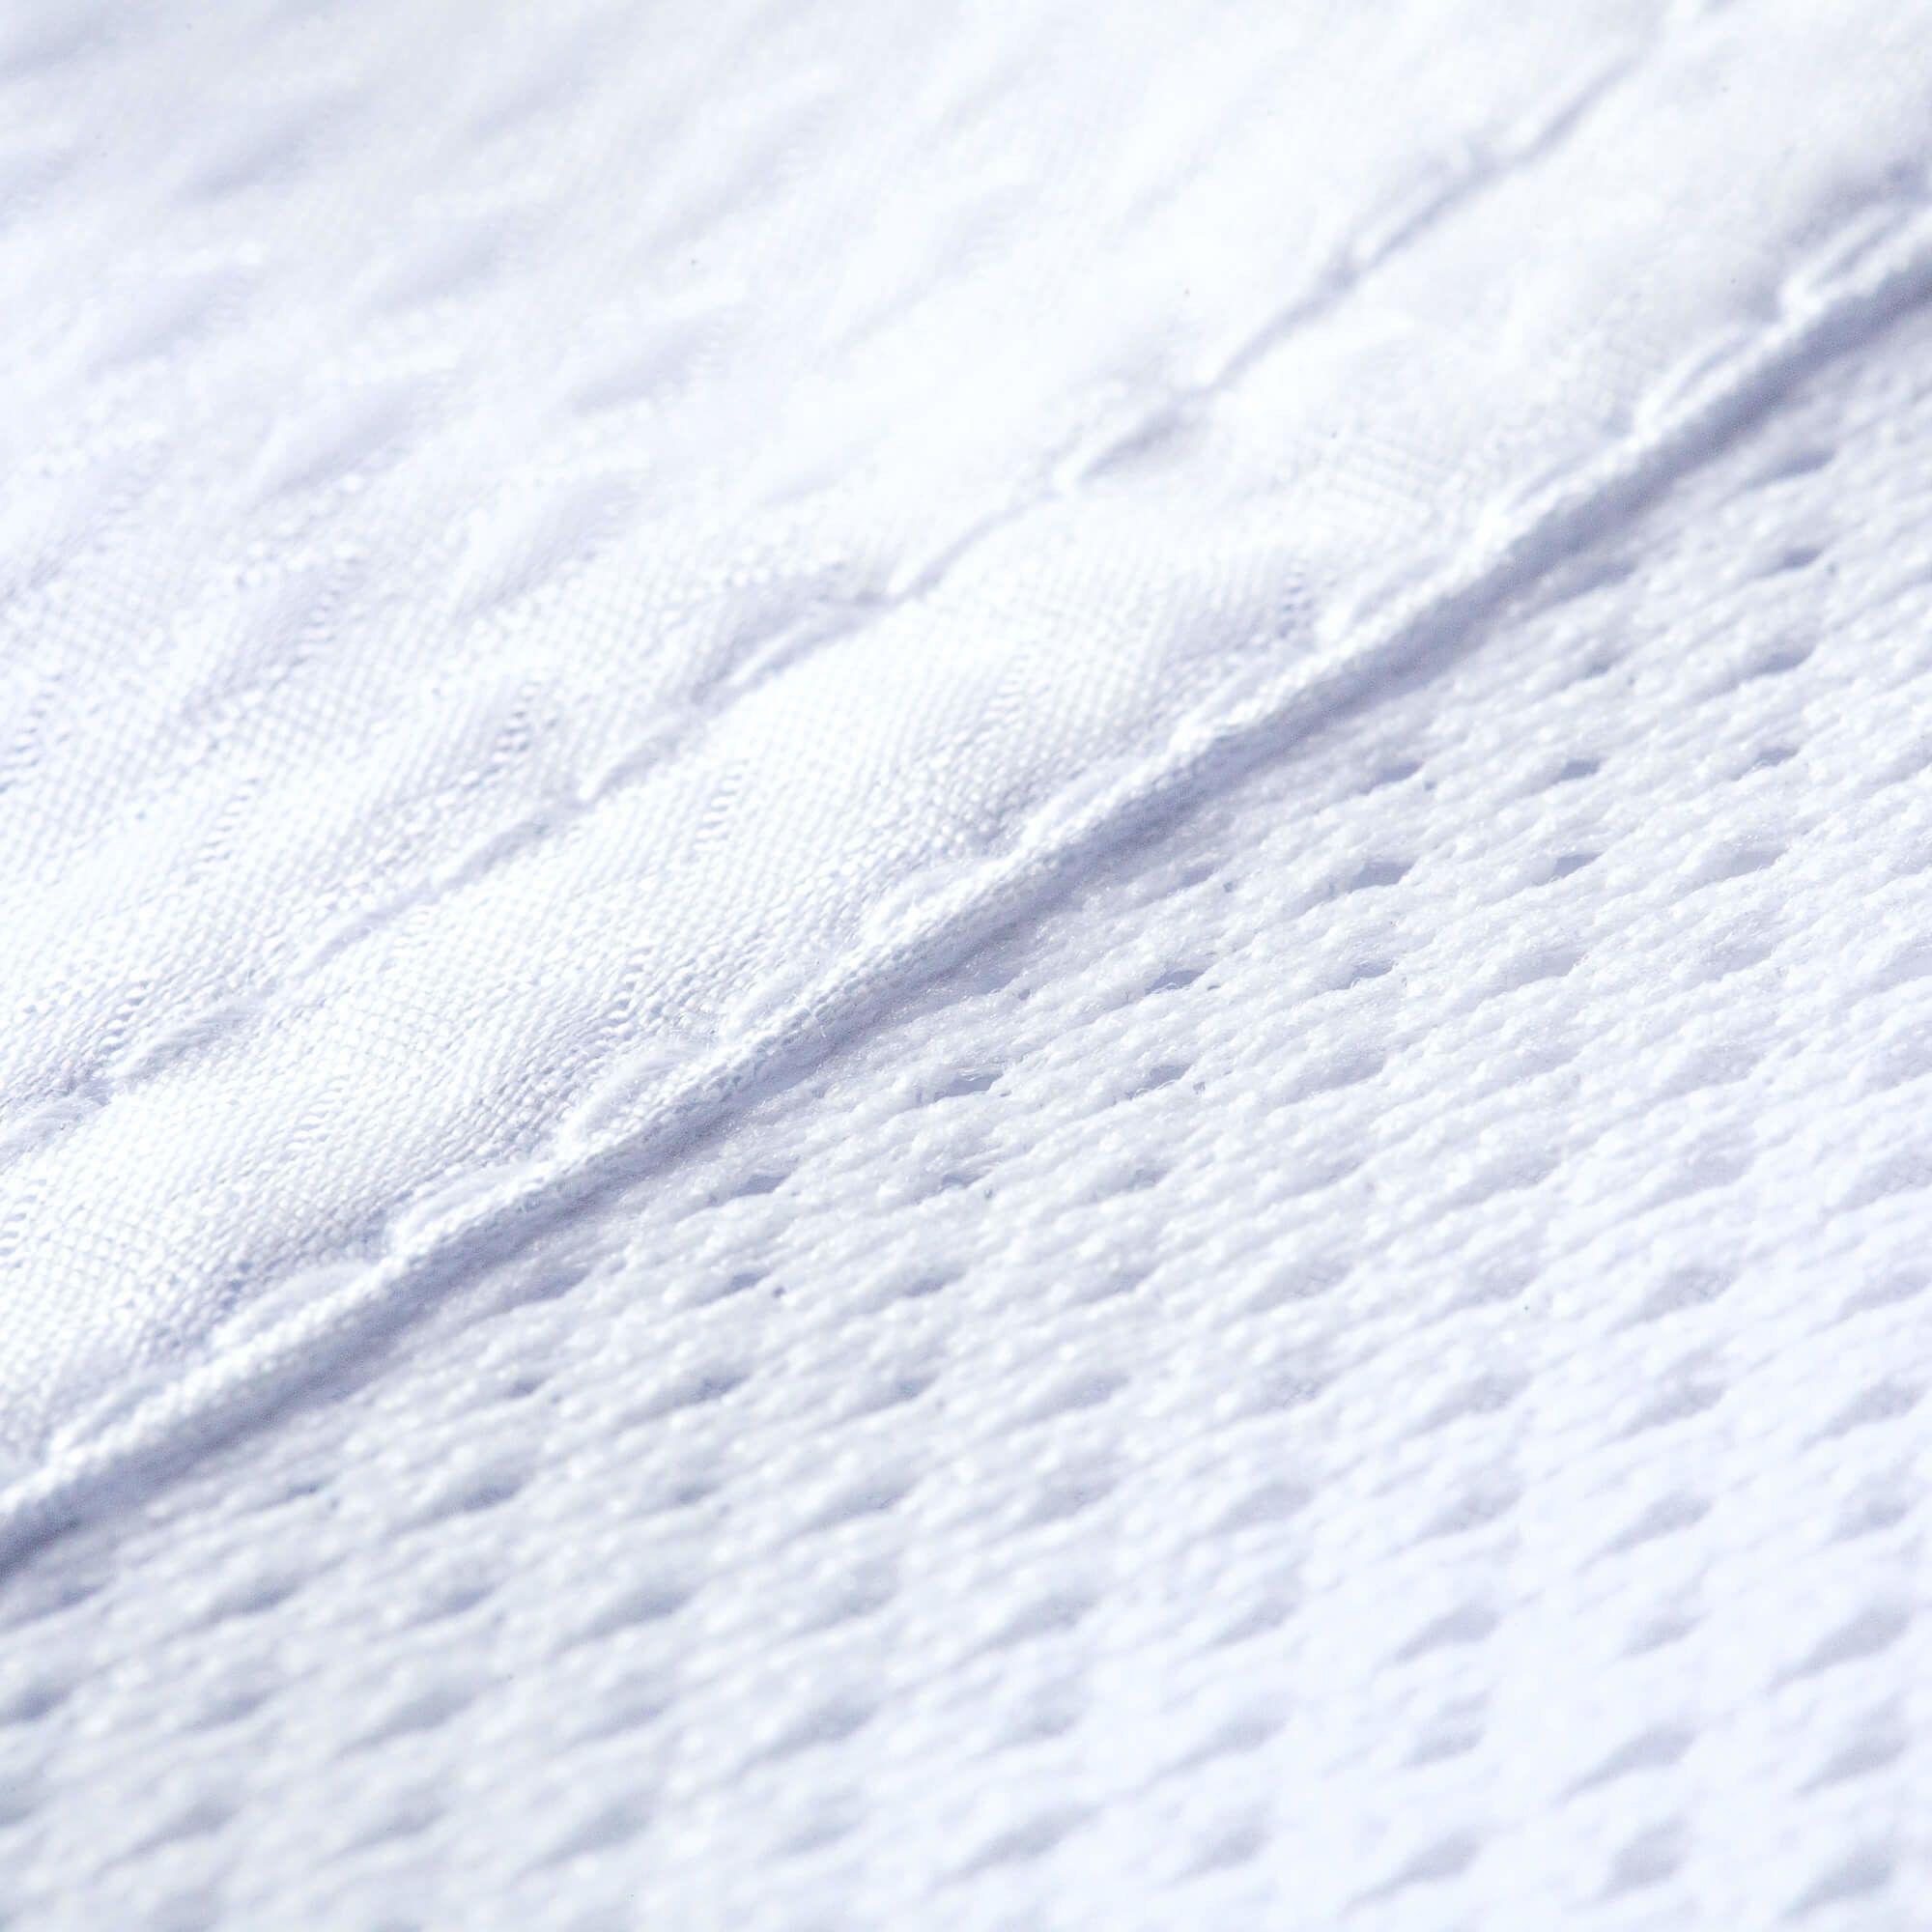 Childrens World Taekwondo White Collar Fighter Uniform